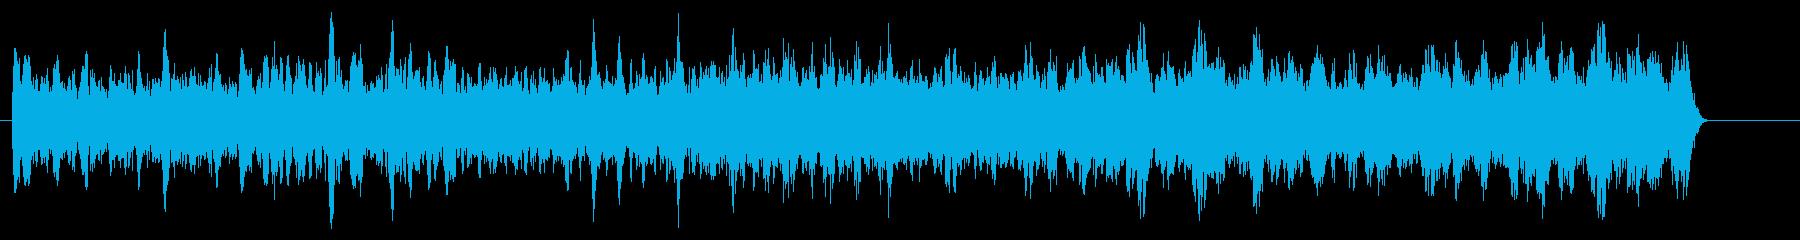 (SE)ビーム砲、荷電粒子砲-加速の再生済みの波形